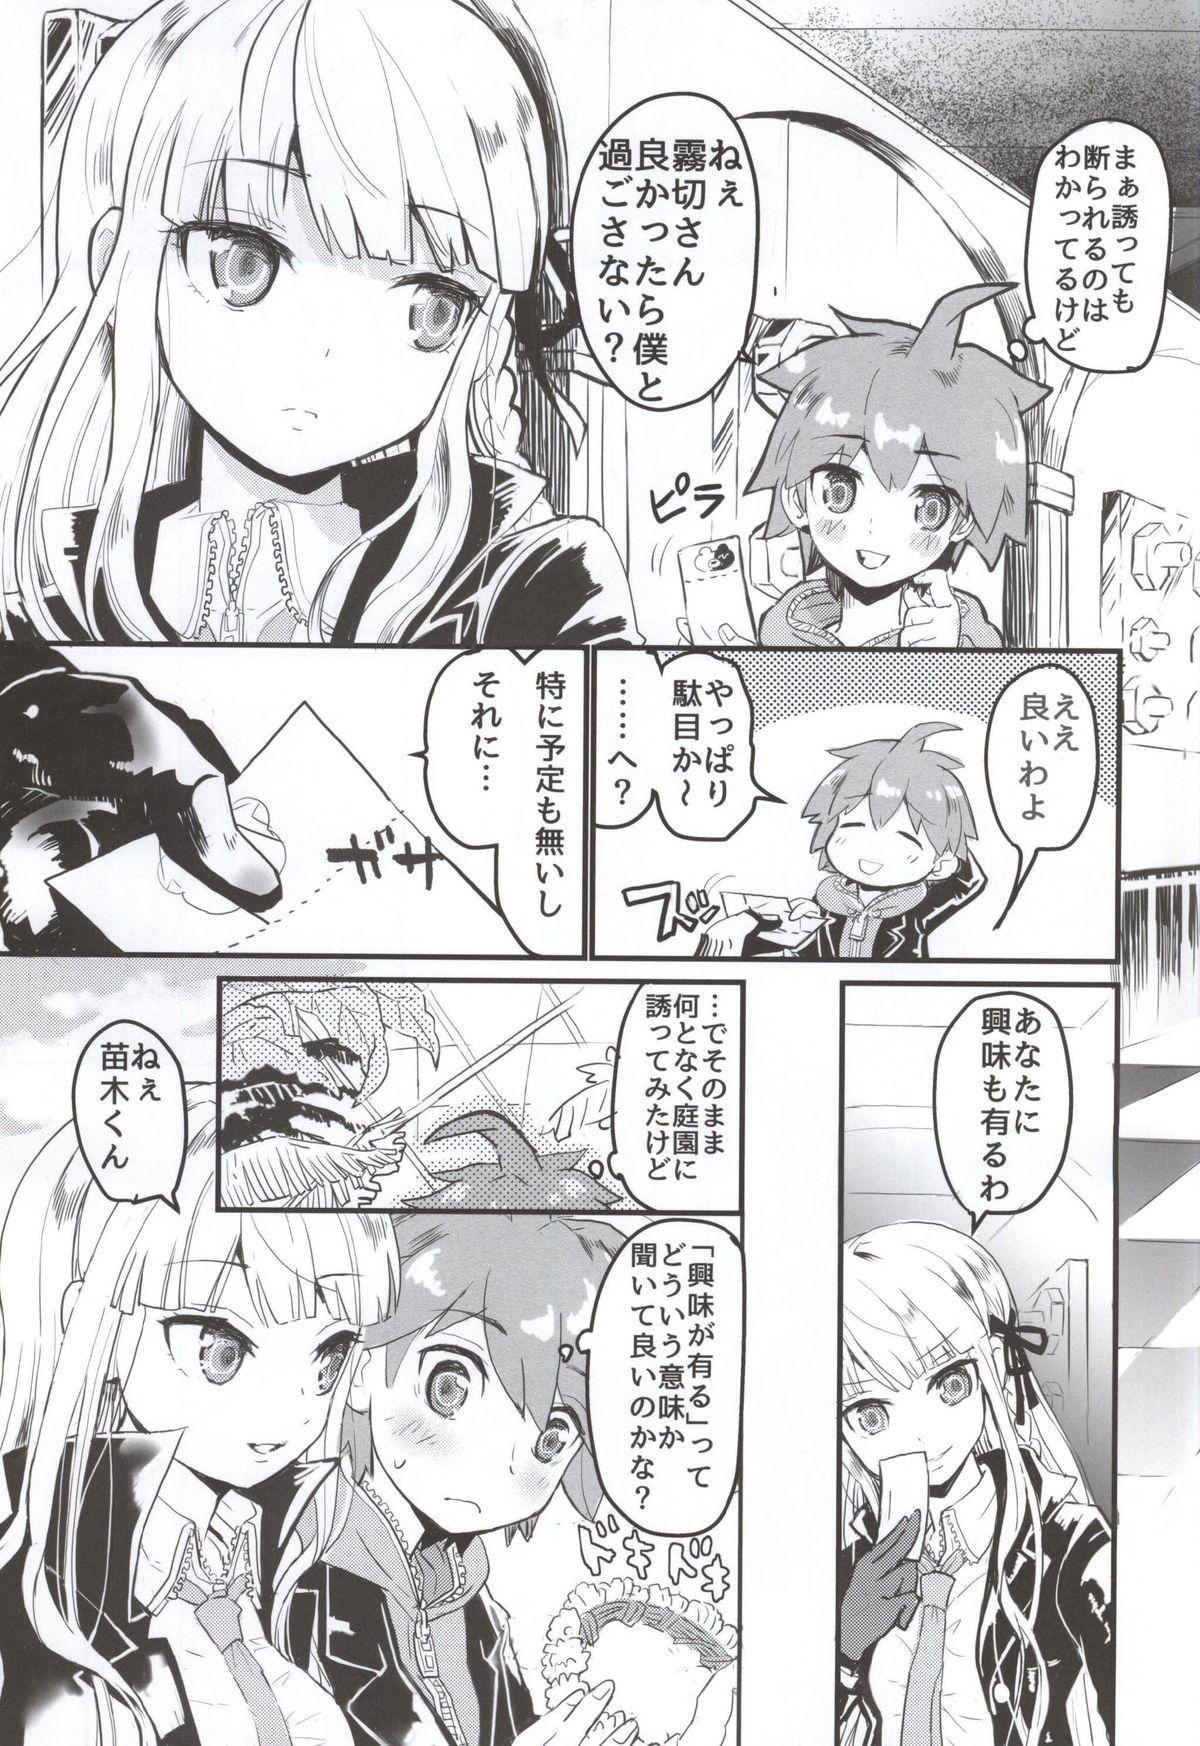 Kirigiri-san to Issho ni School Mode 3